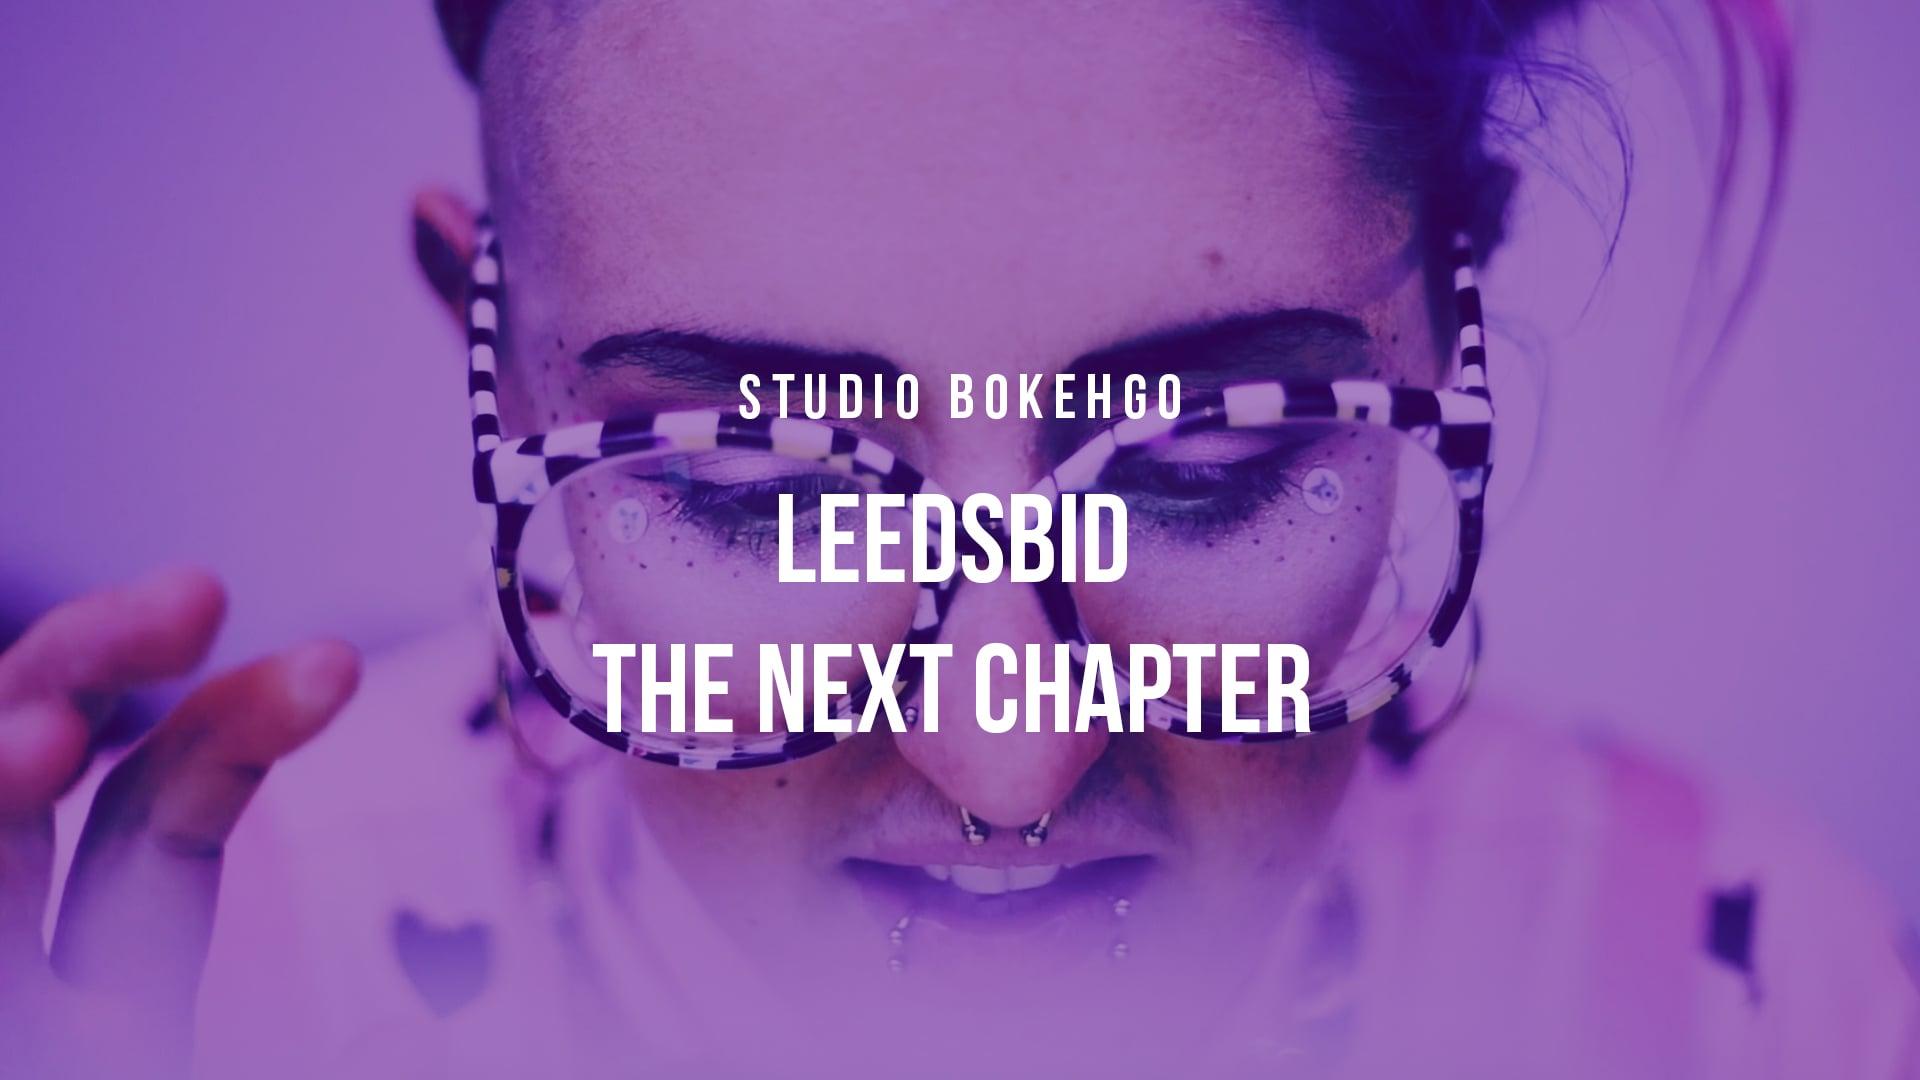 The Official LeedsBID Next Chapter Film - Studio Bokehgo